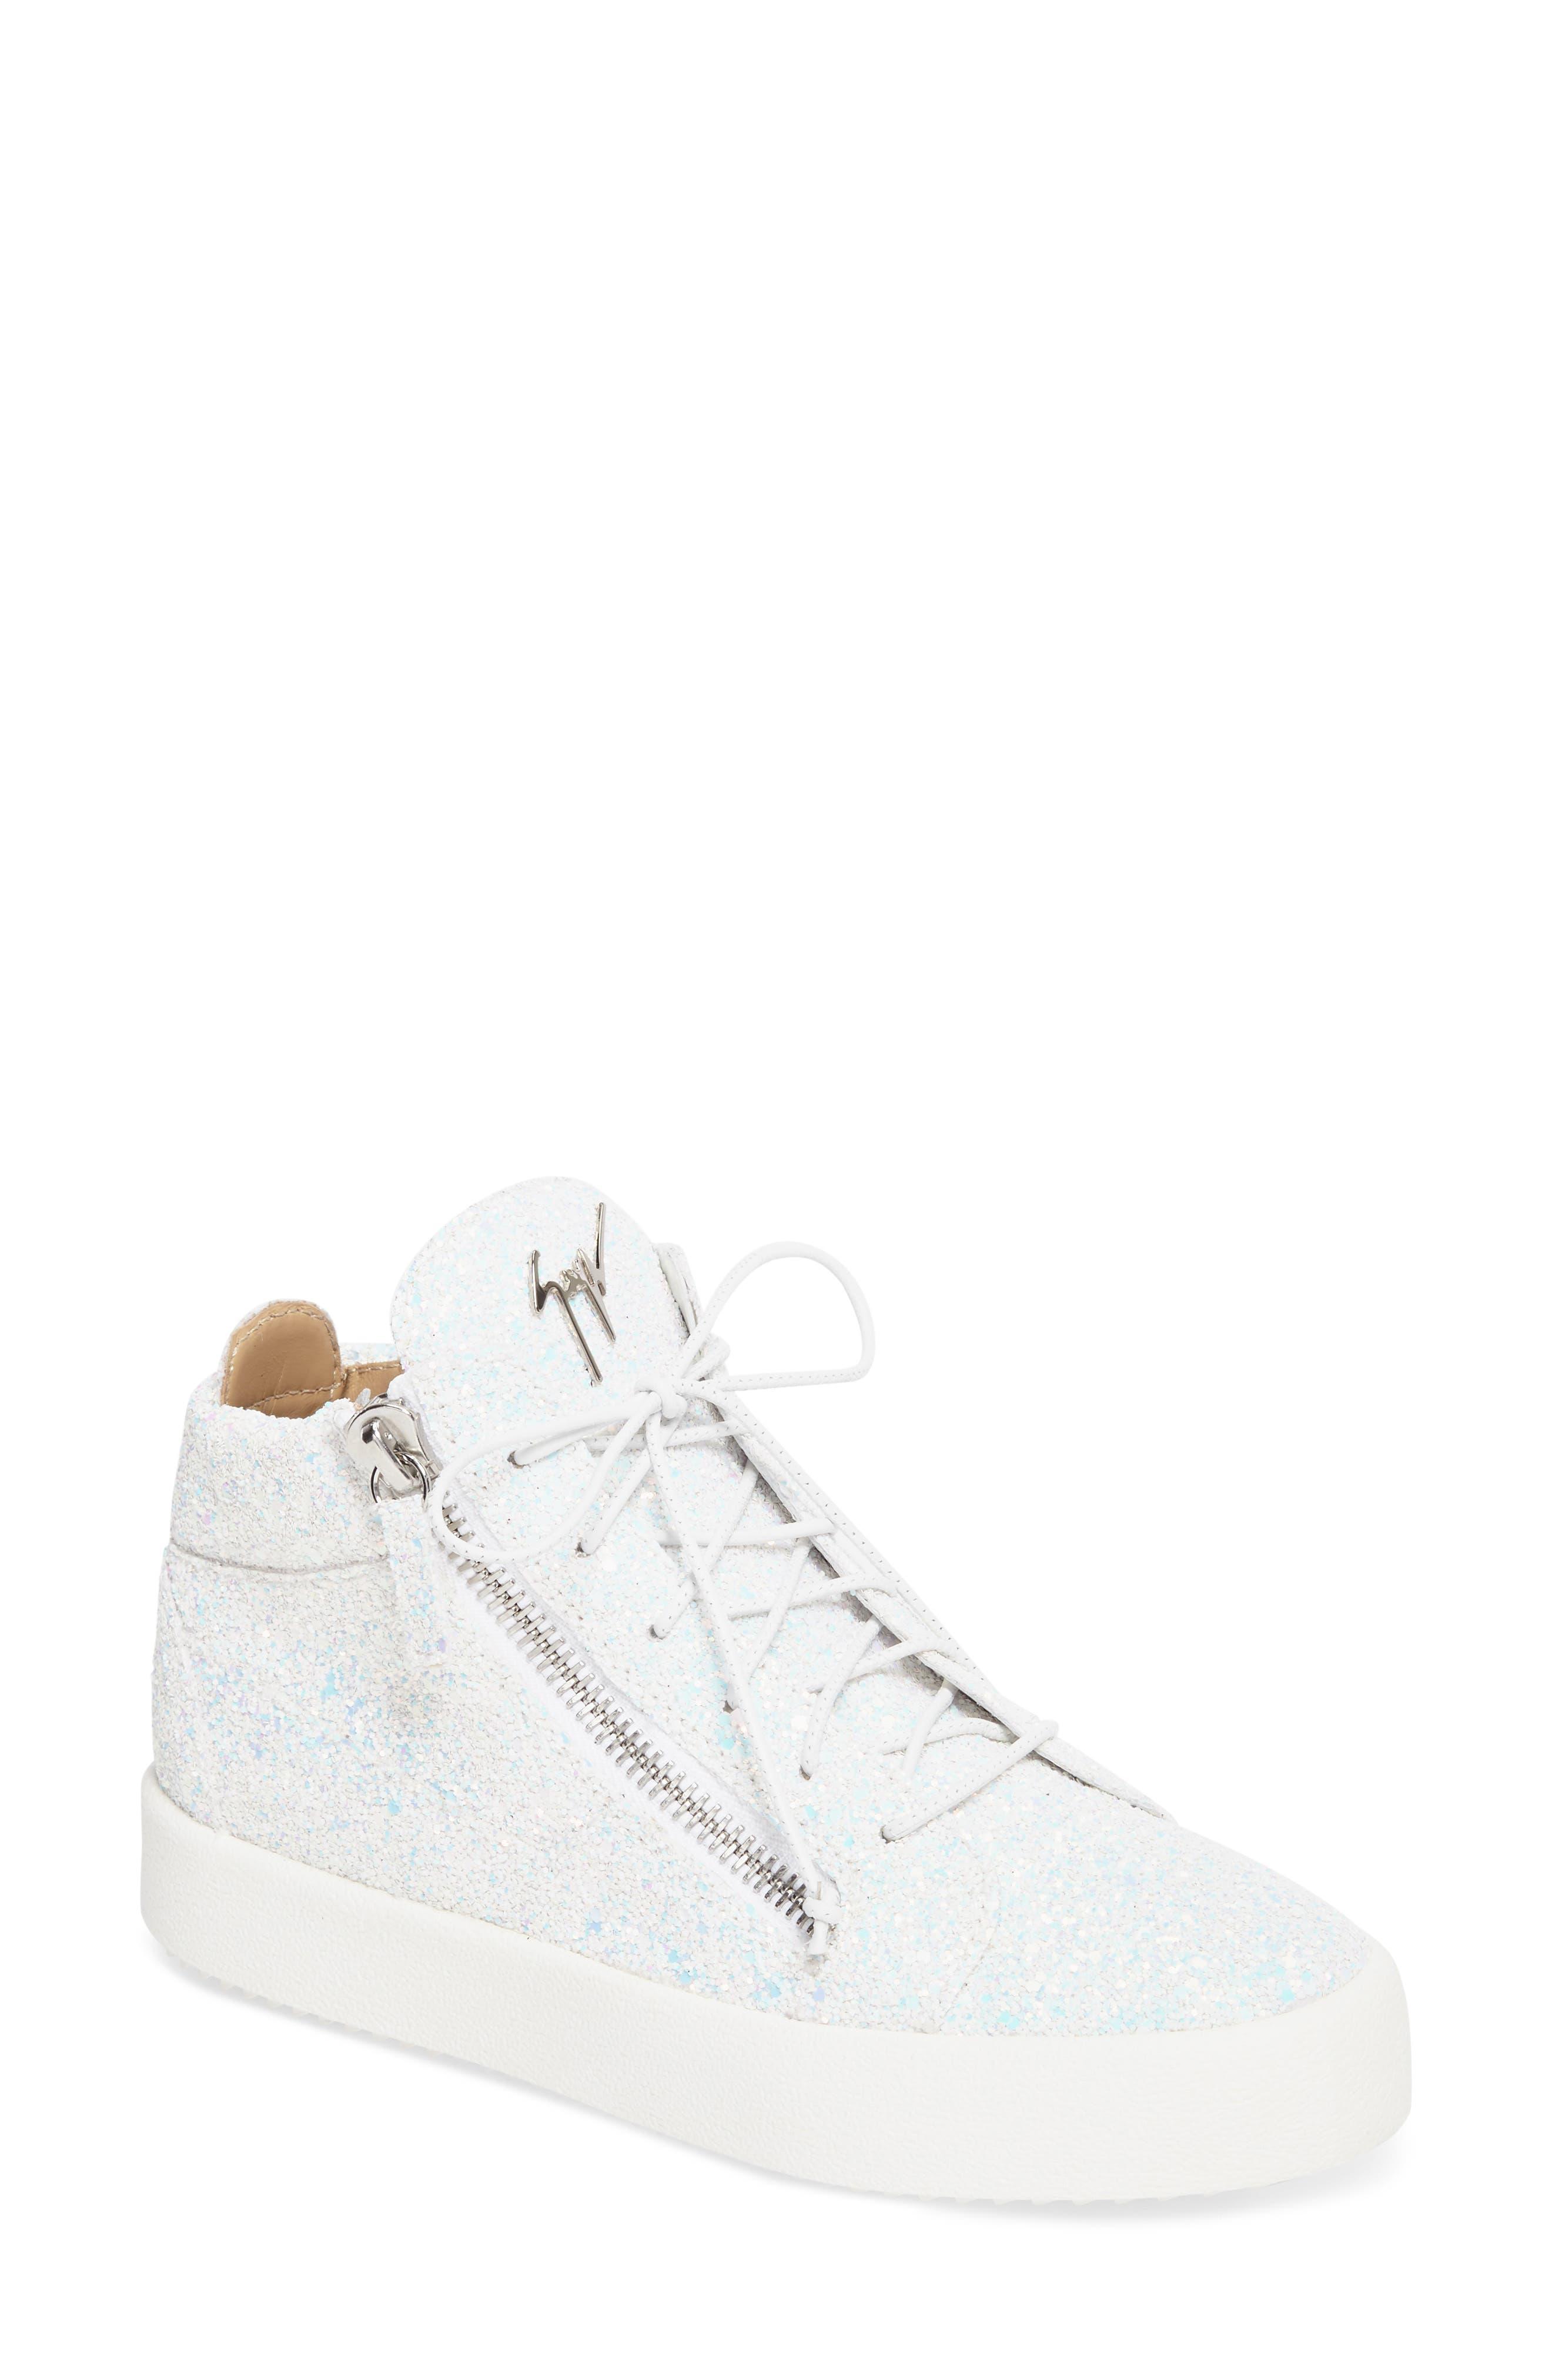 Main Image - Giuseppe Zanotti May London High Top Sneaker (Women)